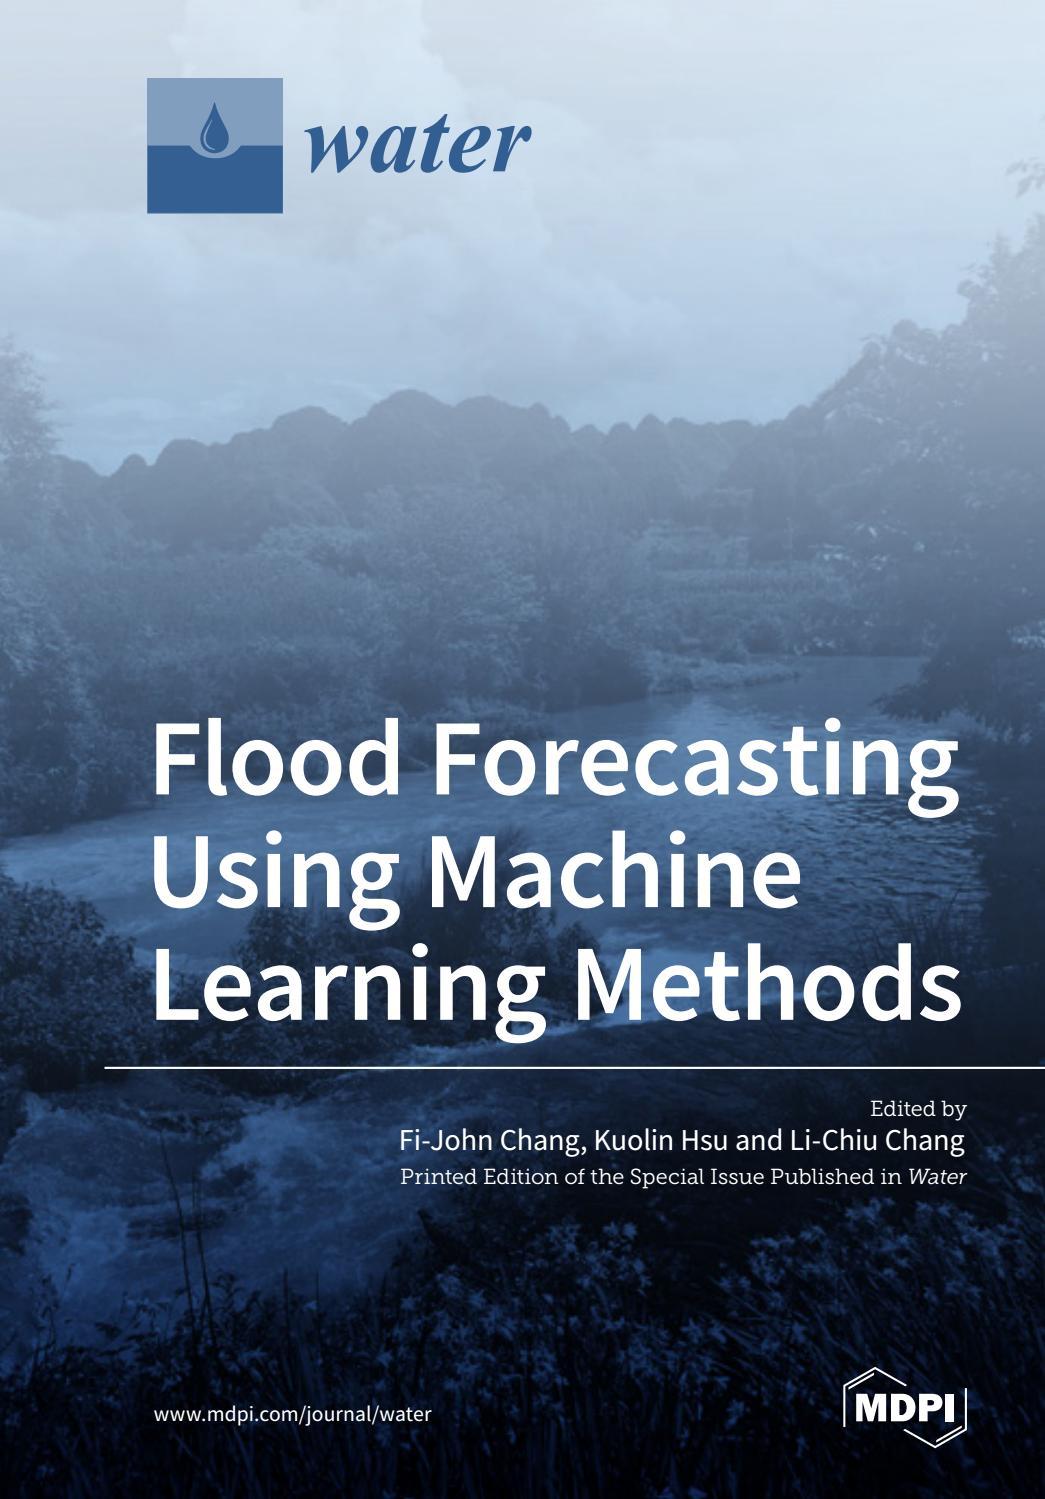 Flood Forecasting Using Machine Learning Methods by Amir